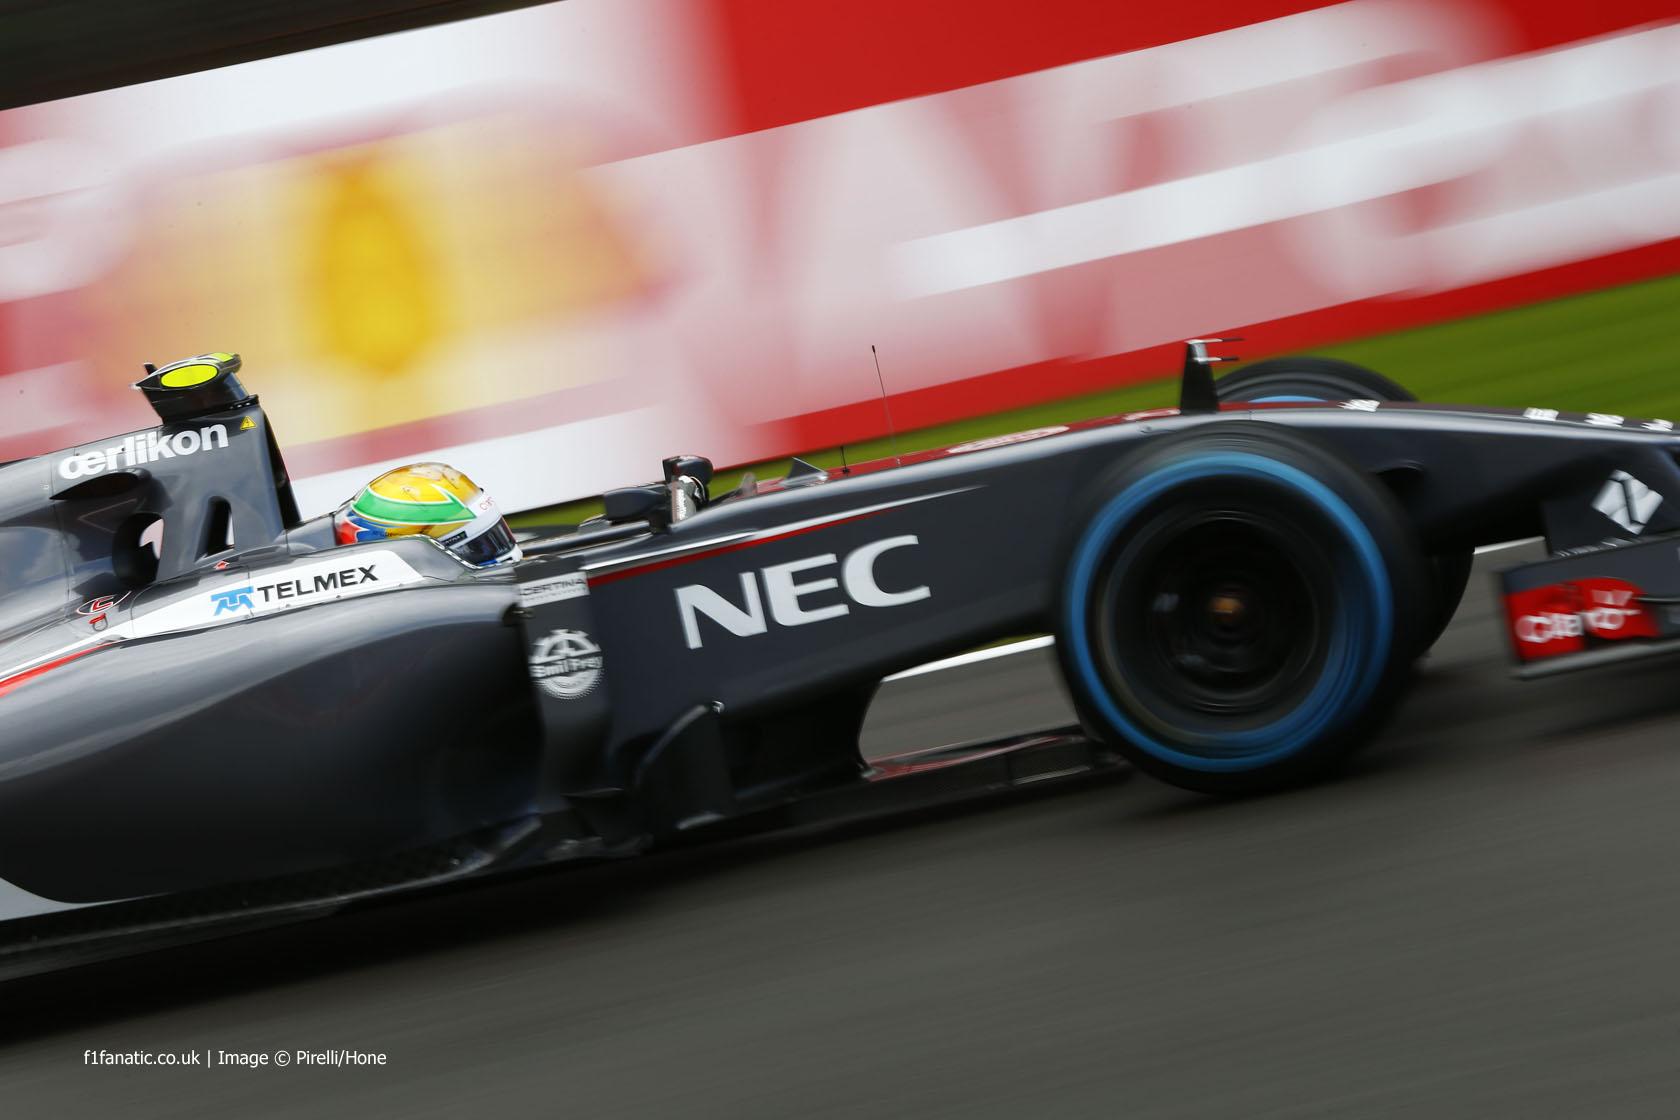 Esteban Gutierrez, Sauber, Spa-Francorchamps, 2014